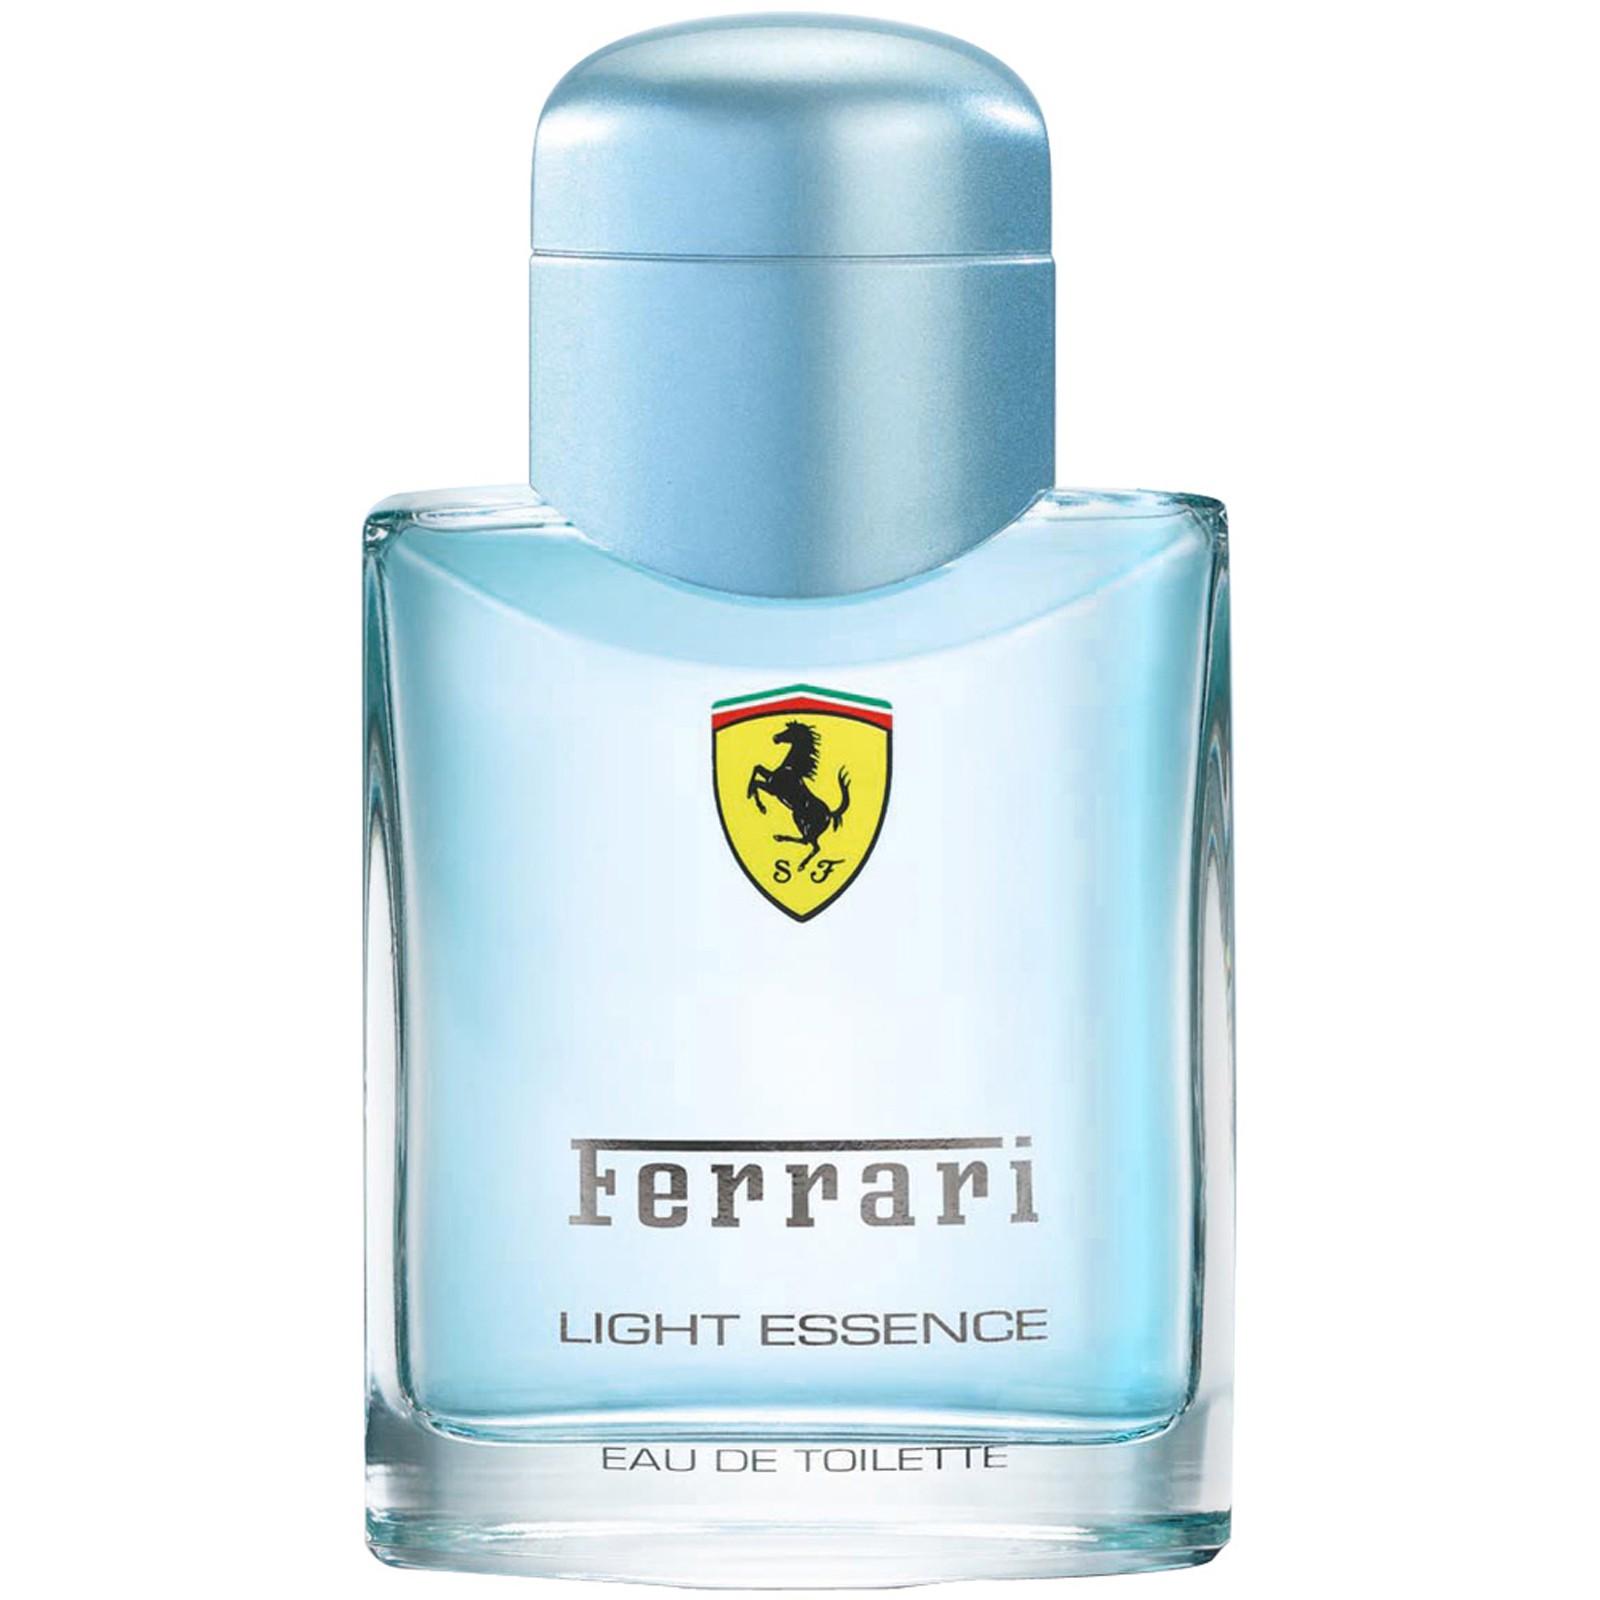 Ferrari Light Essence аромат для мужчин